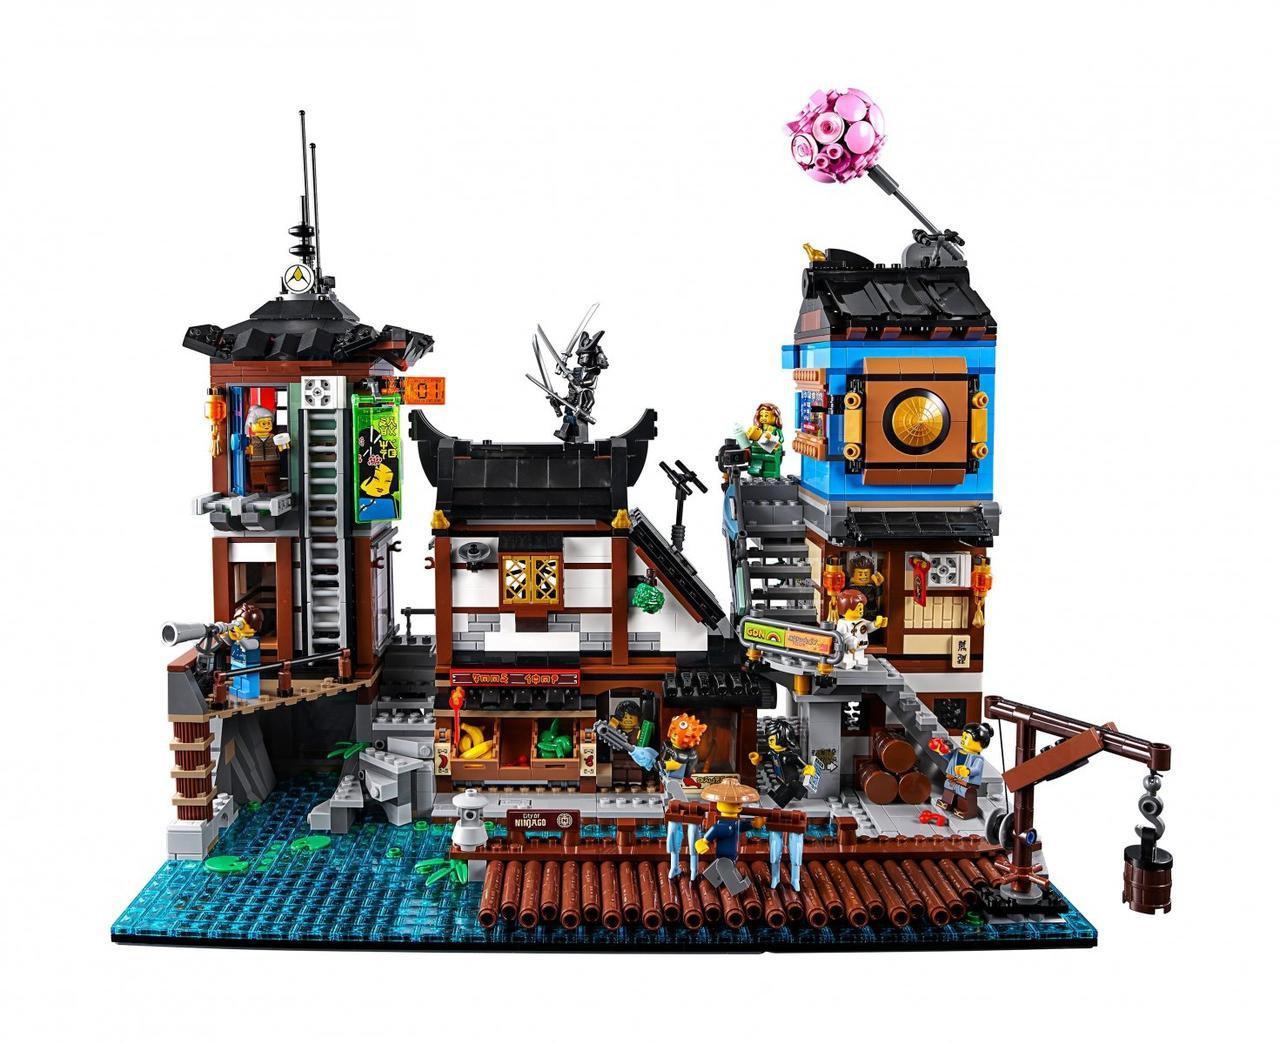 Конструктор Bela Ninja 10941 Порт Ниндзяго Сити 3635 деталей Аналог Lego Ninjago 70657